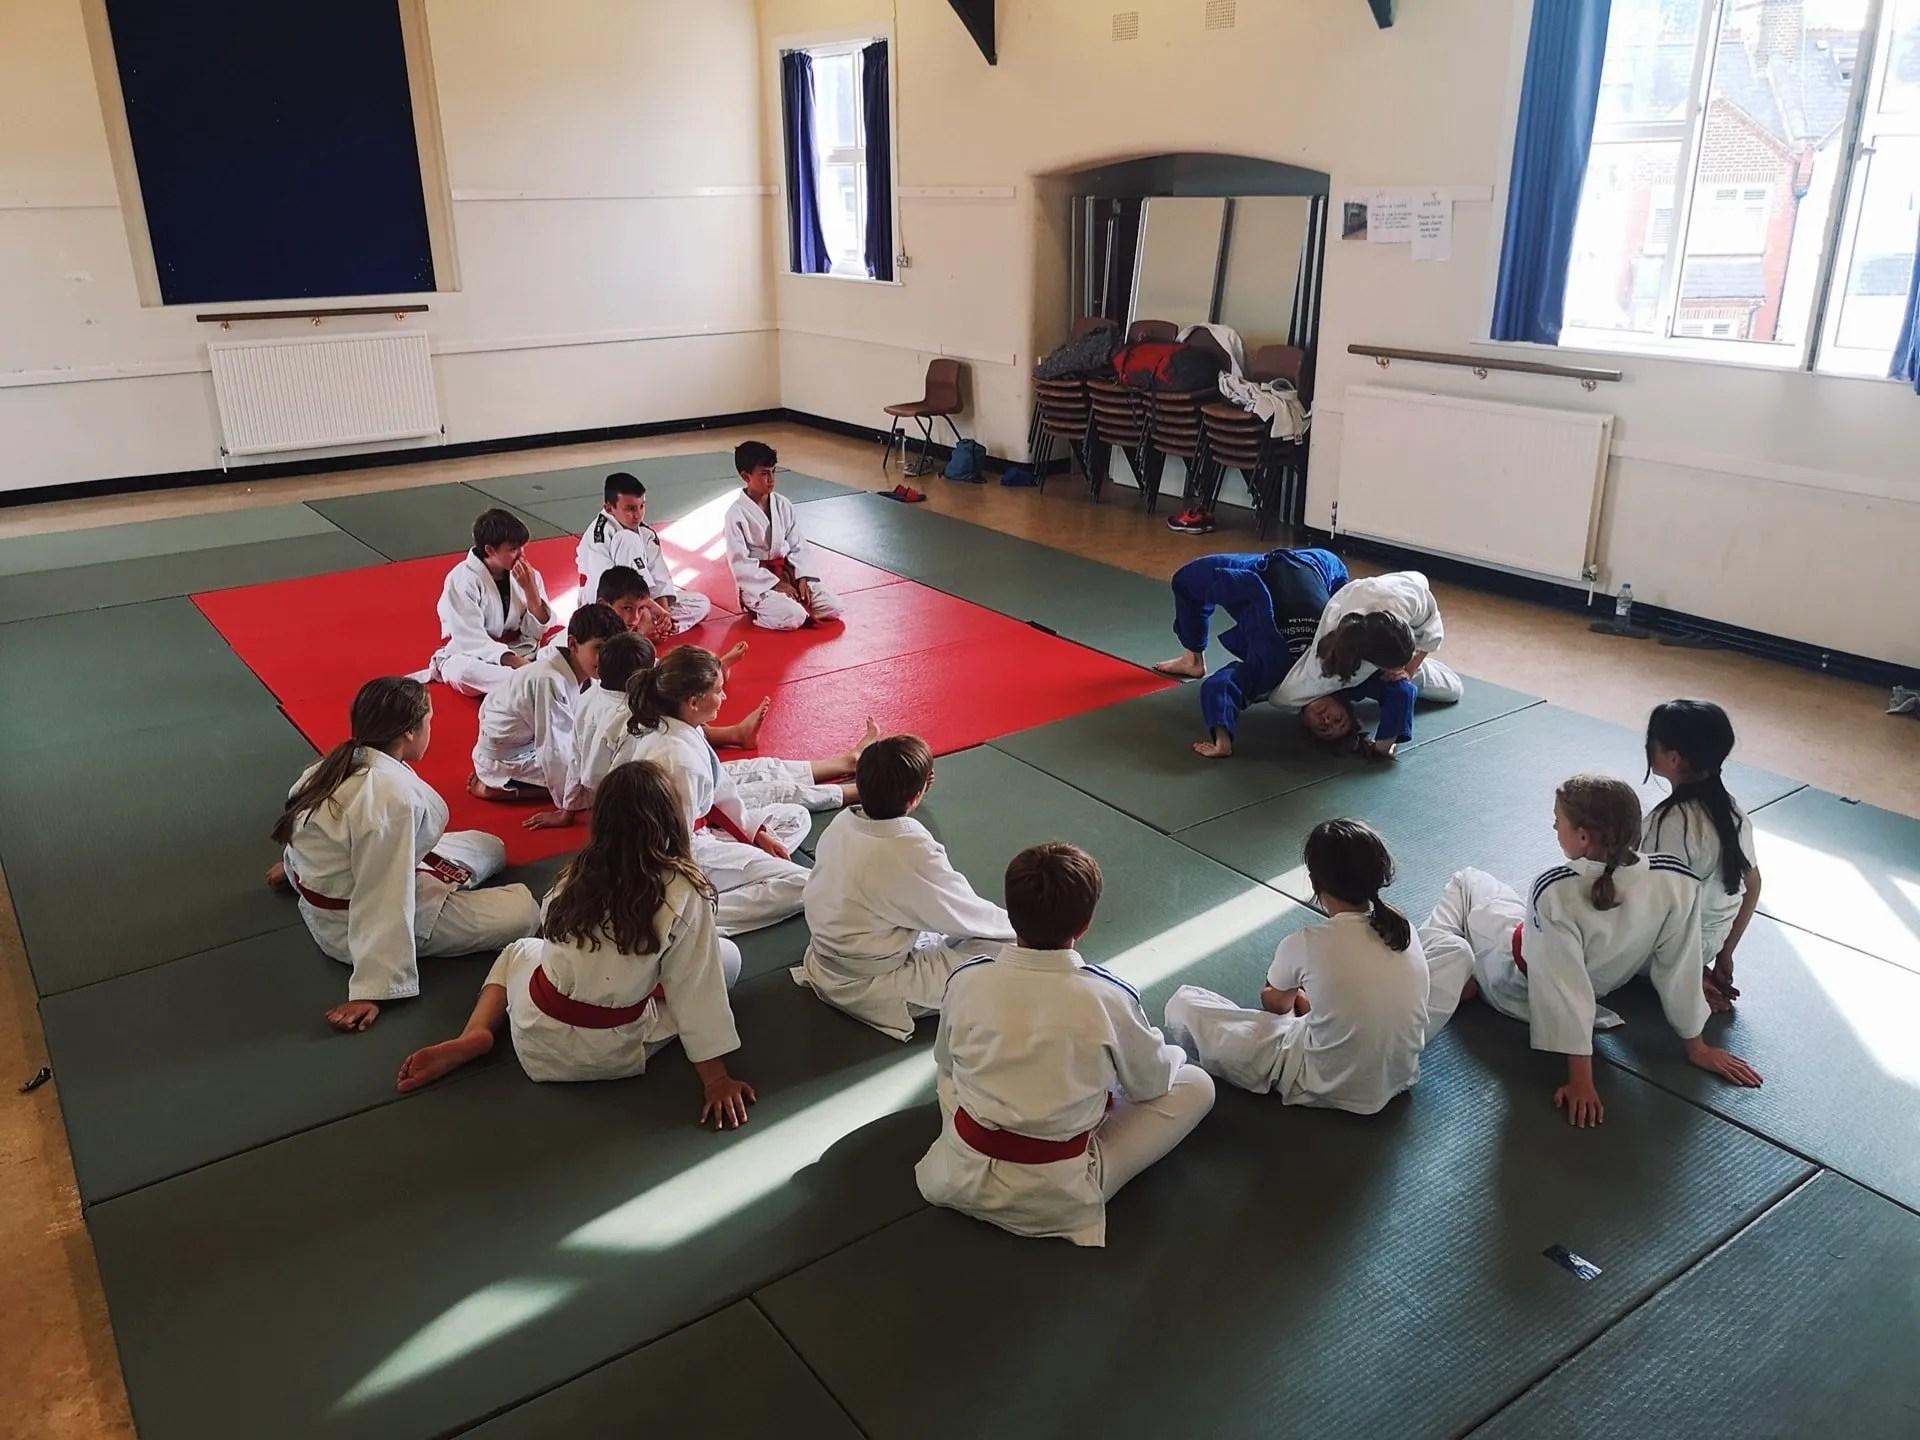 London judo classes